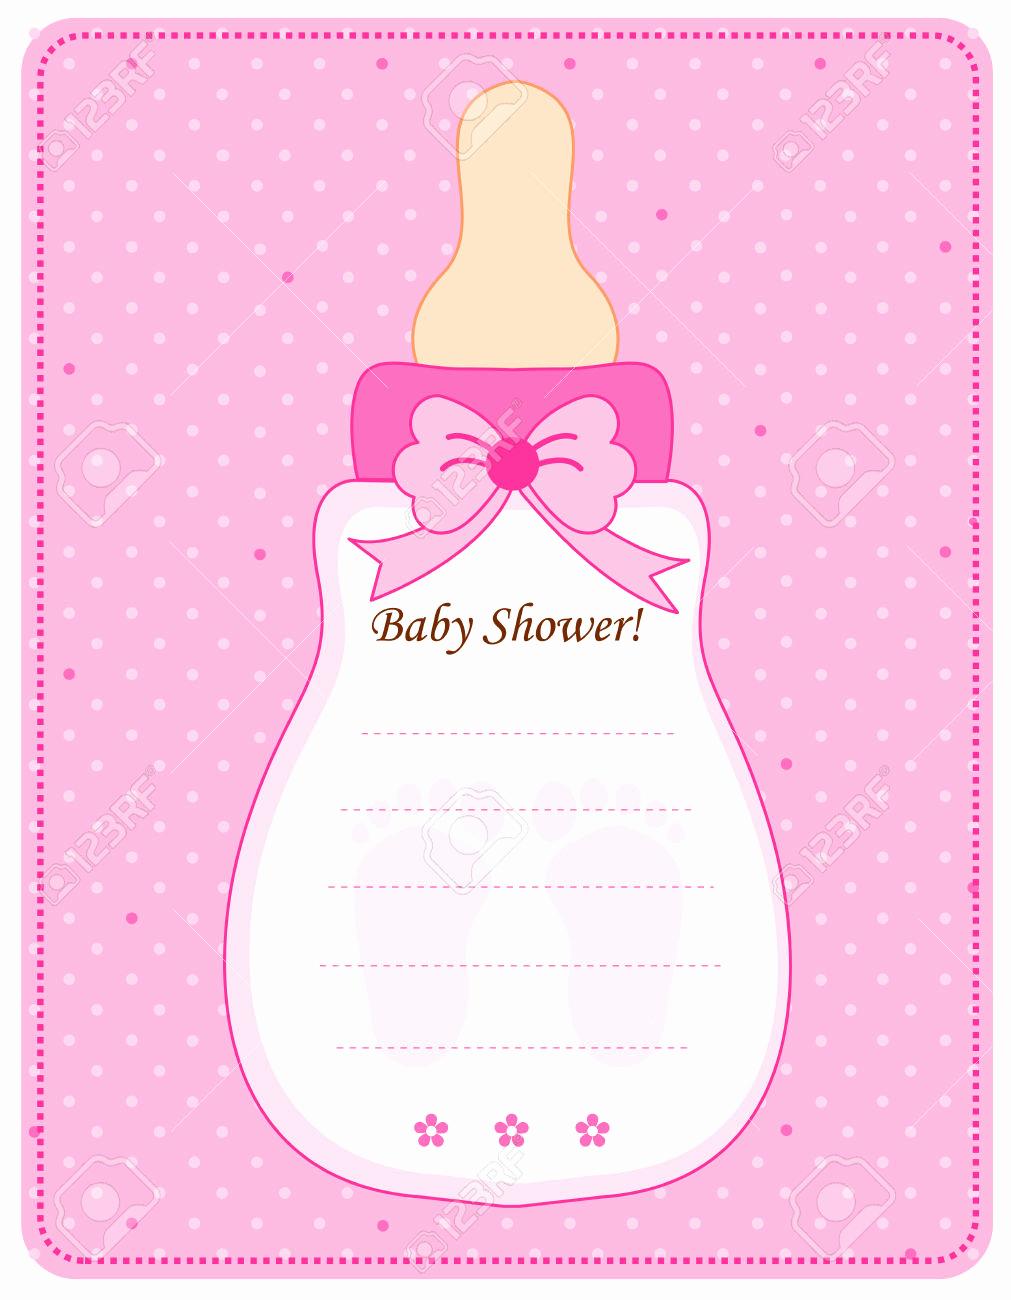 Baby Girl Shower Invitation Ideas Beautiful Baby Shower for Girl